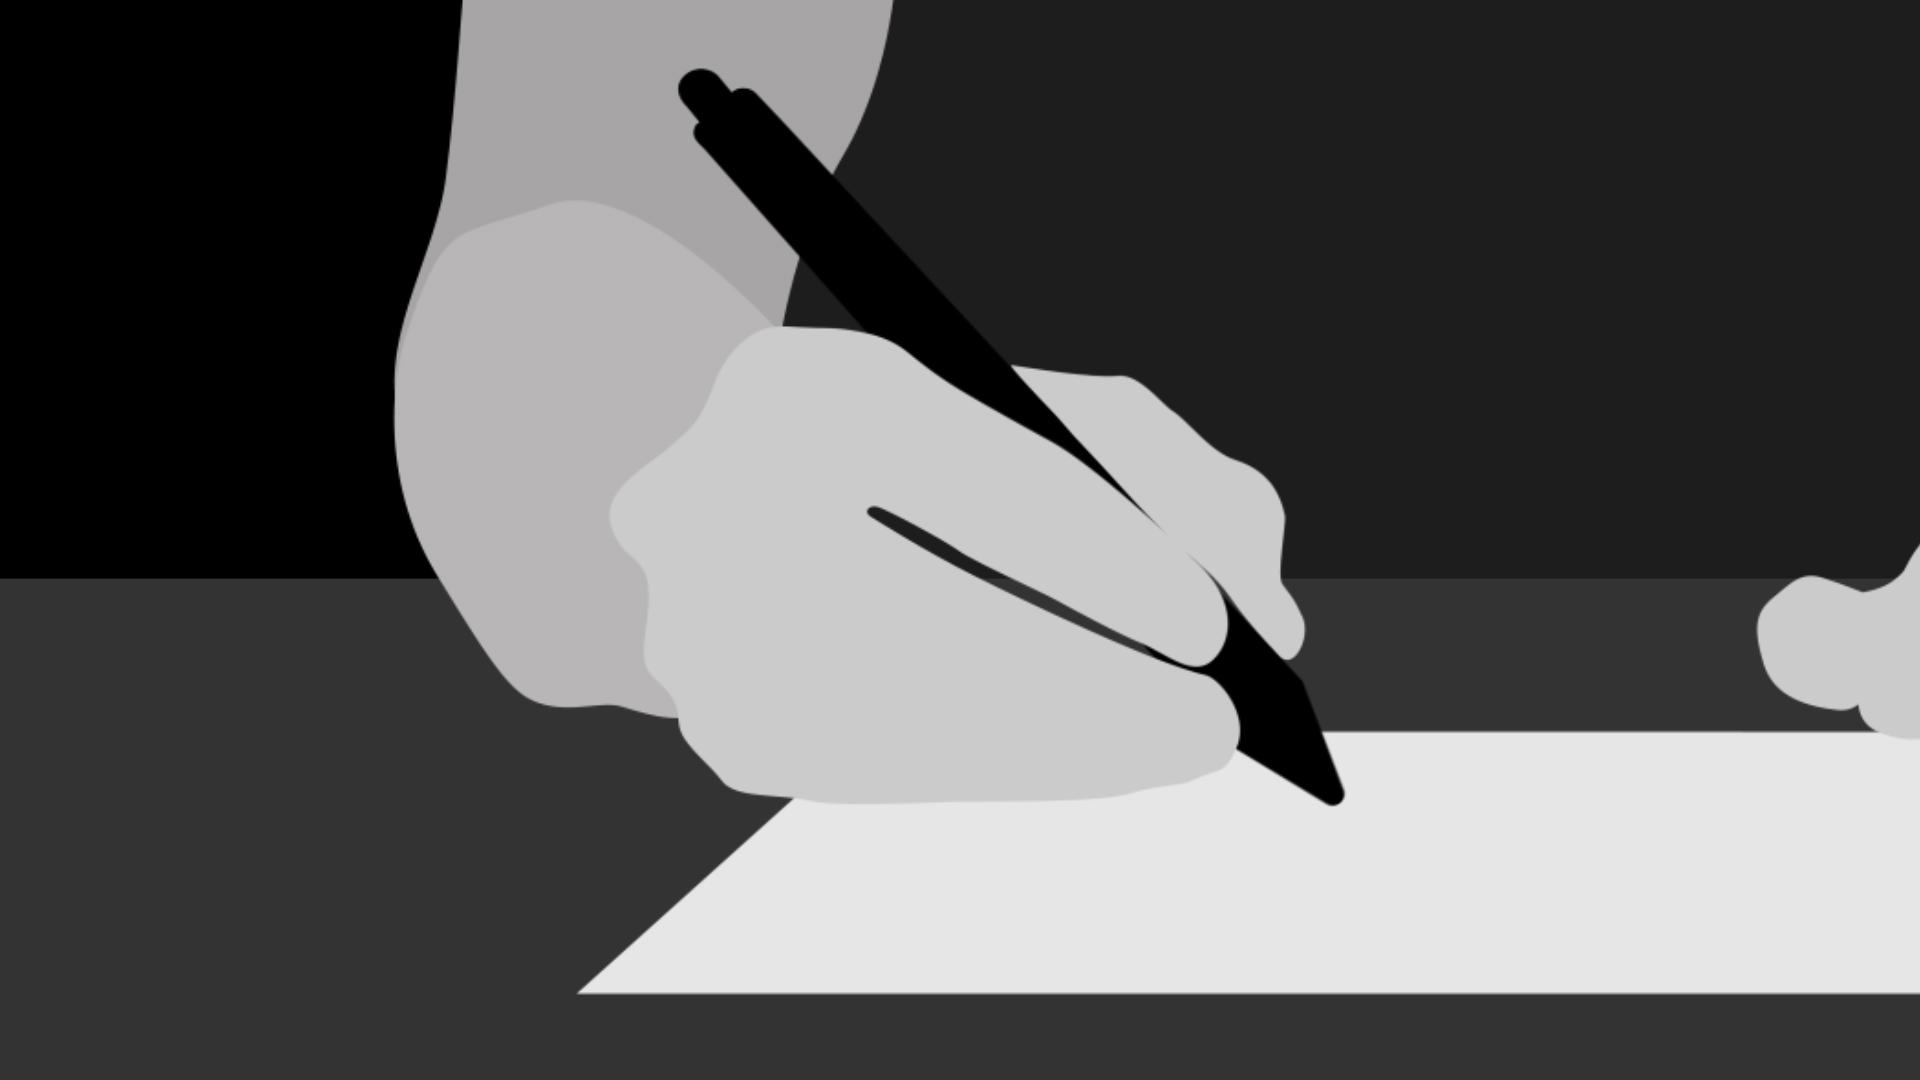 Writing_opioid.jpg